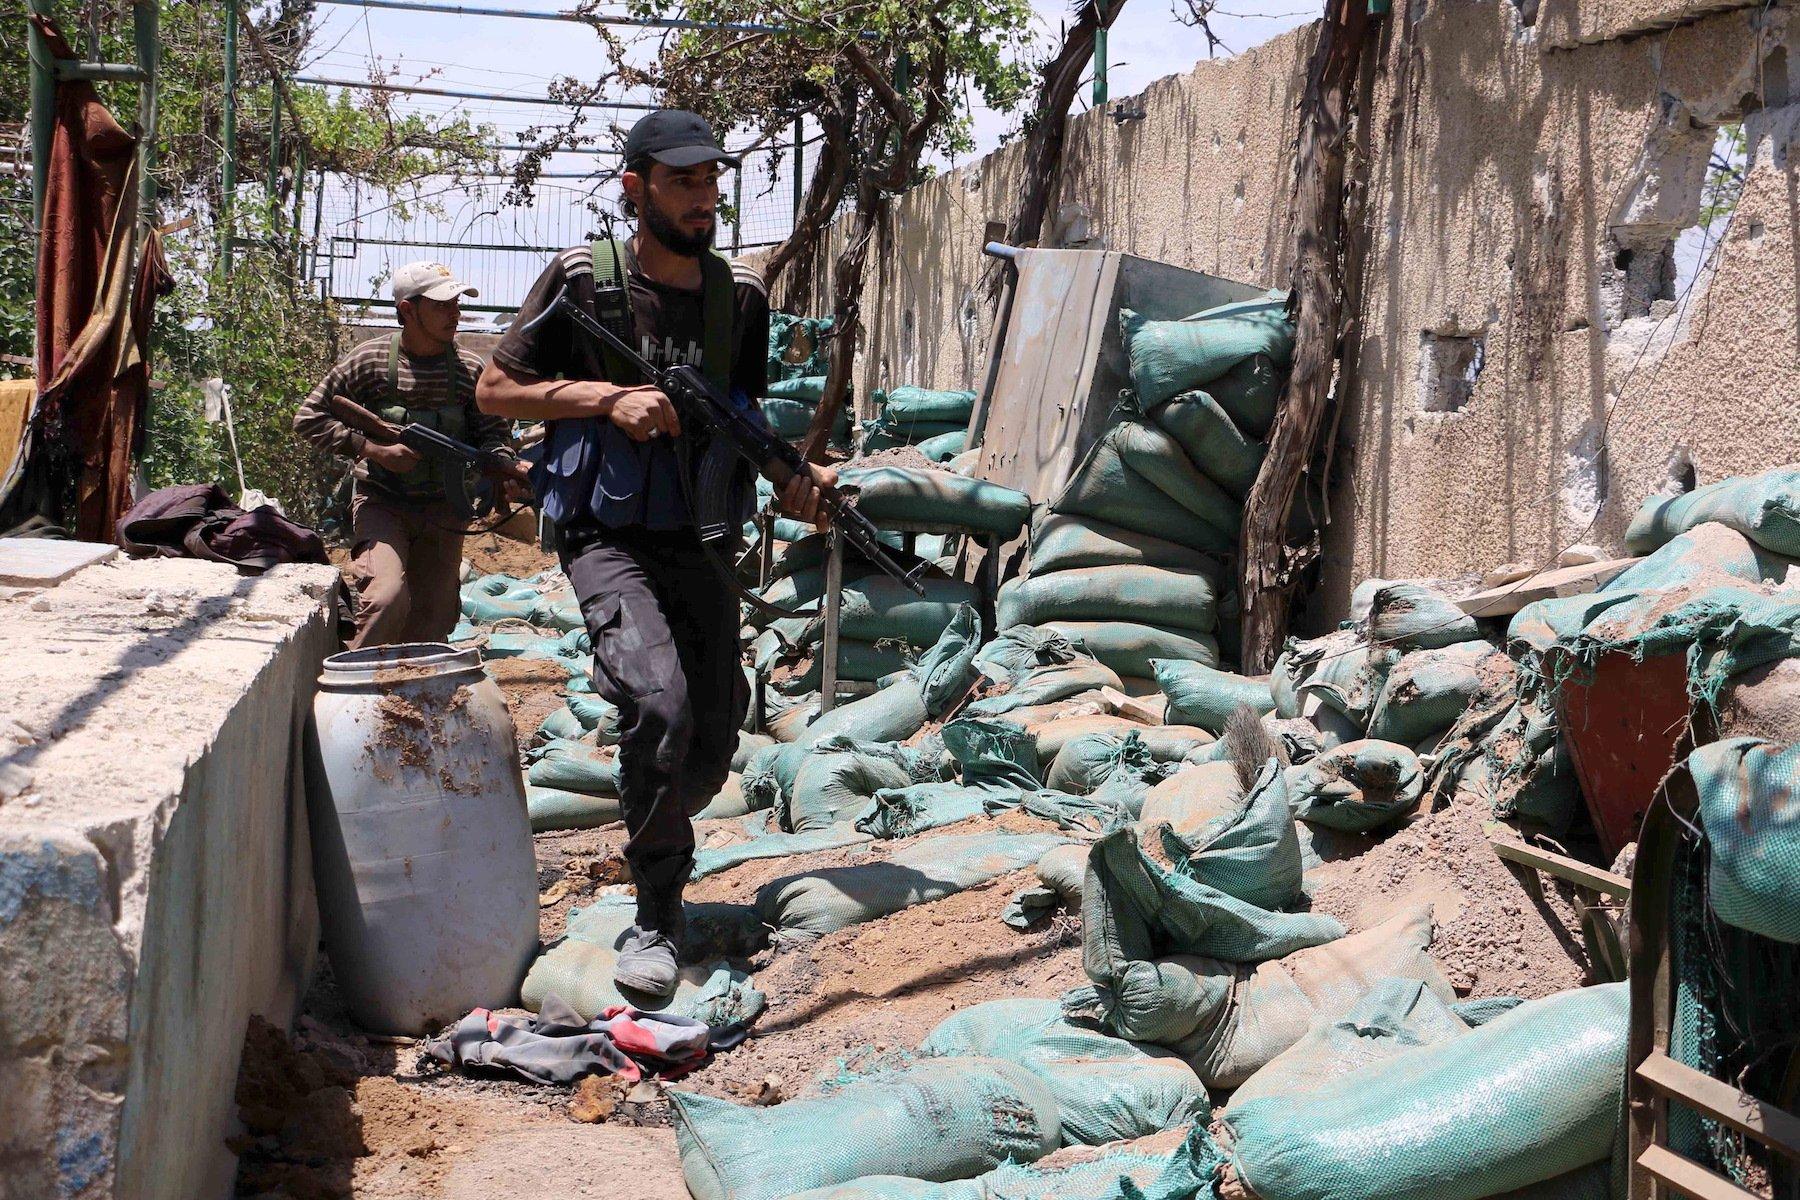 Jaish al-Islam fighters